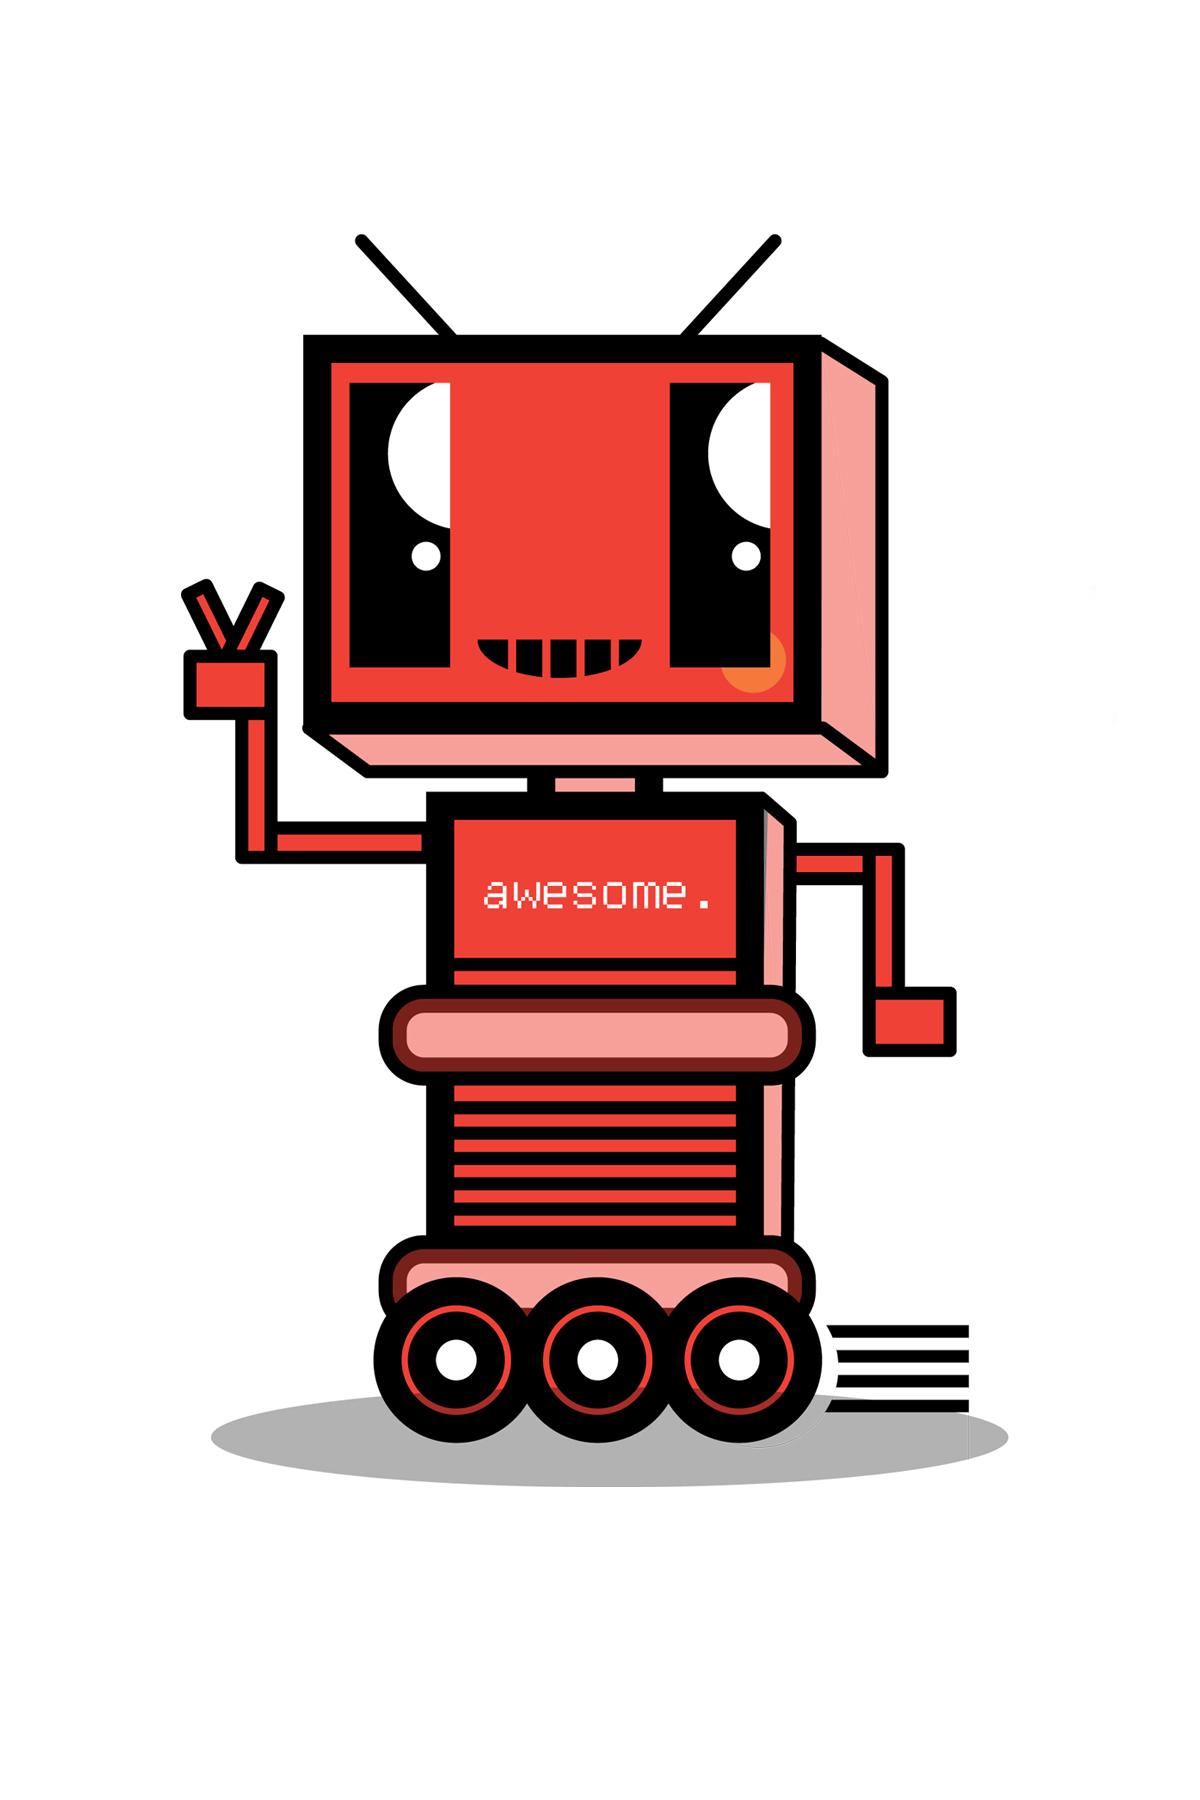 robot character design concept.